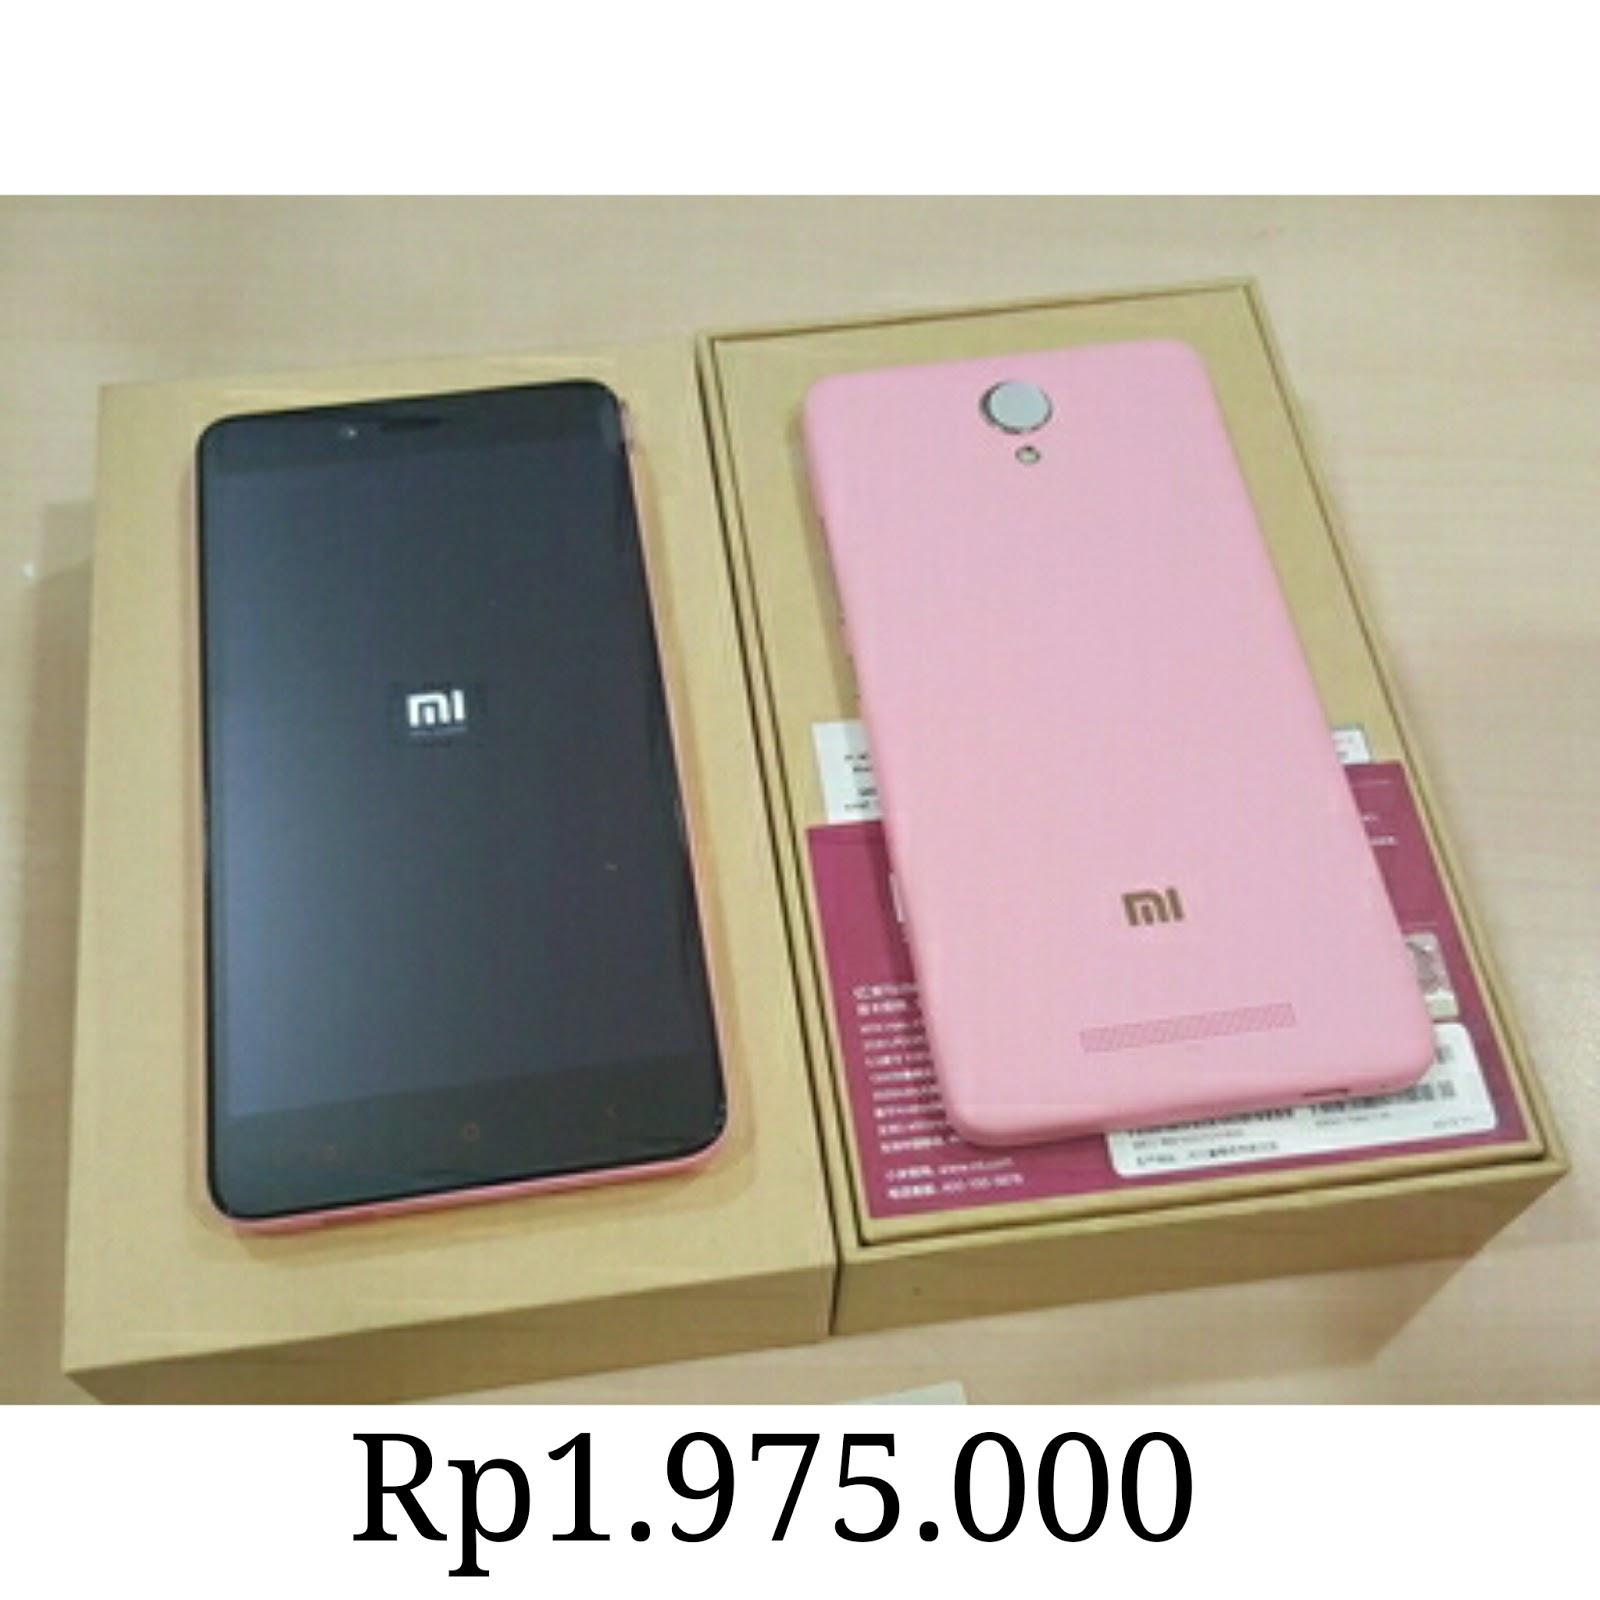 Xiaomi Redmi 2 4g Lte Ram 16gb Rom 8gb Annds Gadget Black White 1gb 8 Gb Garansi Distributor Note Pink 2gb